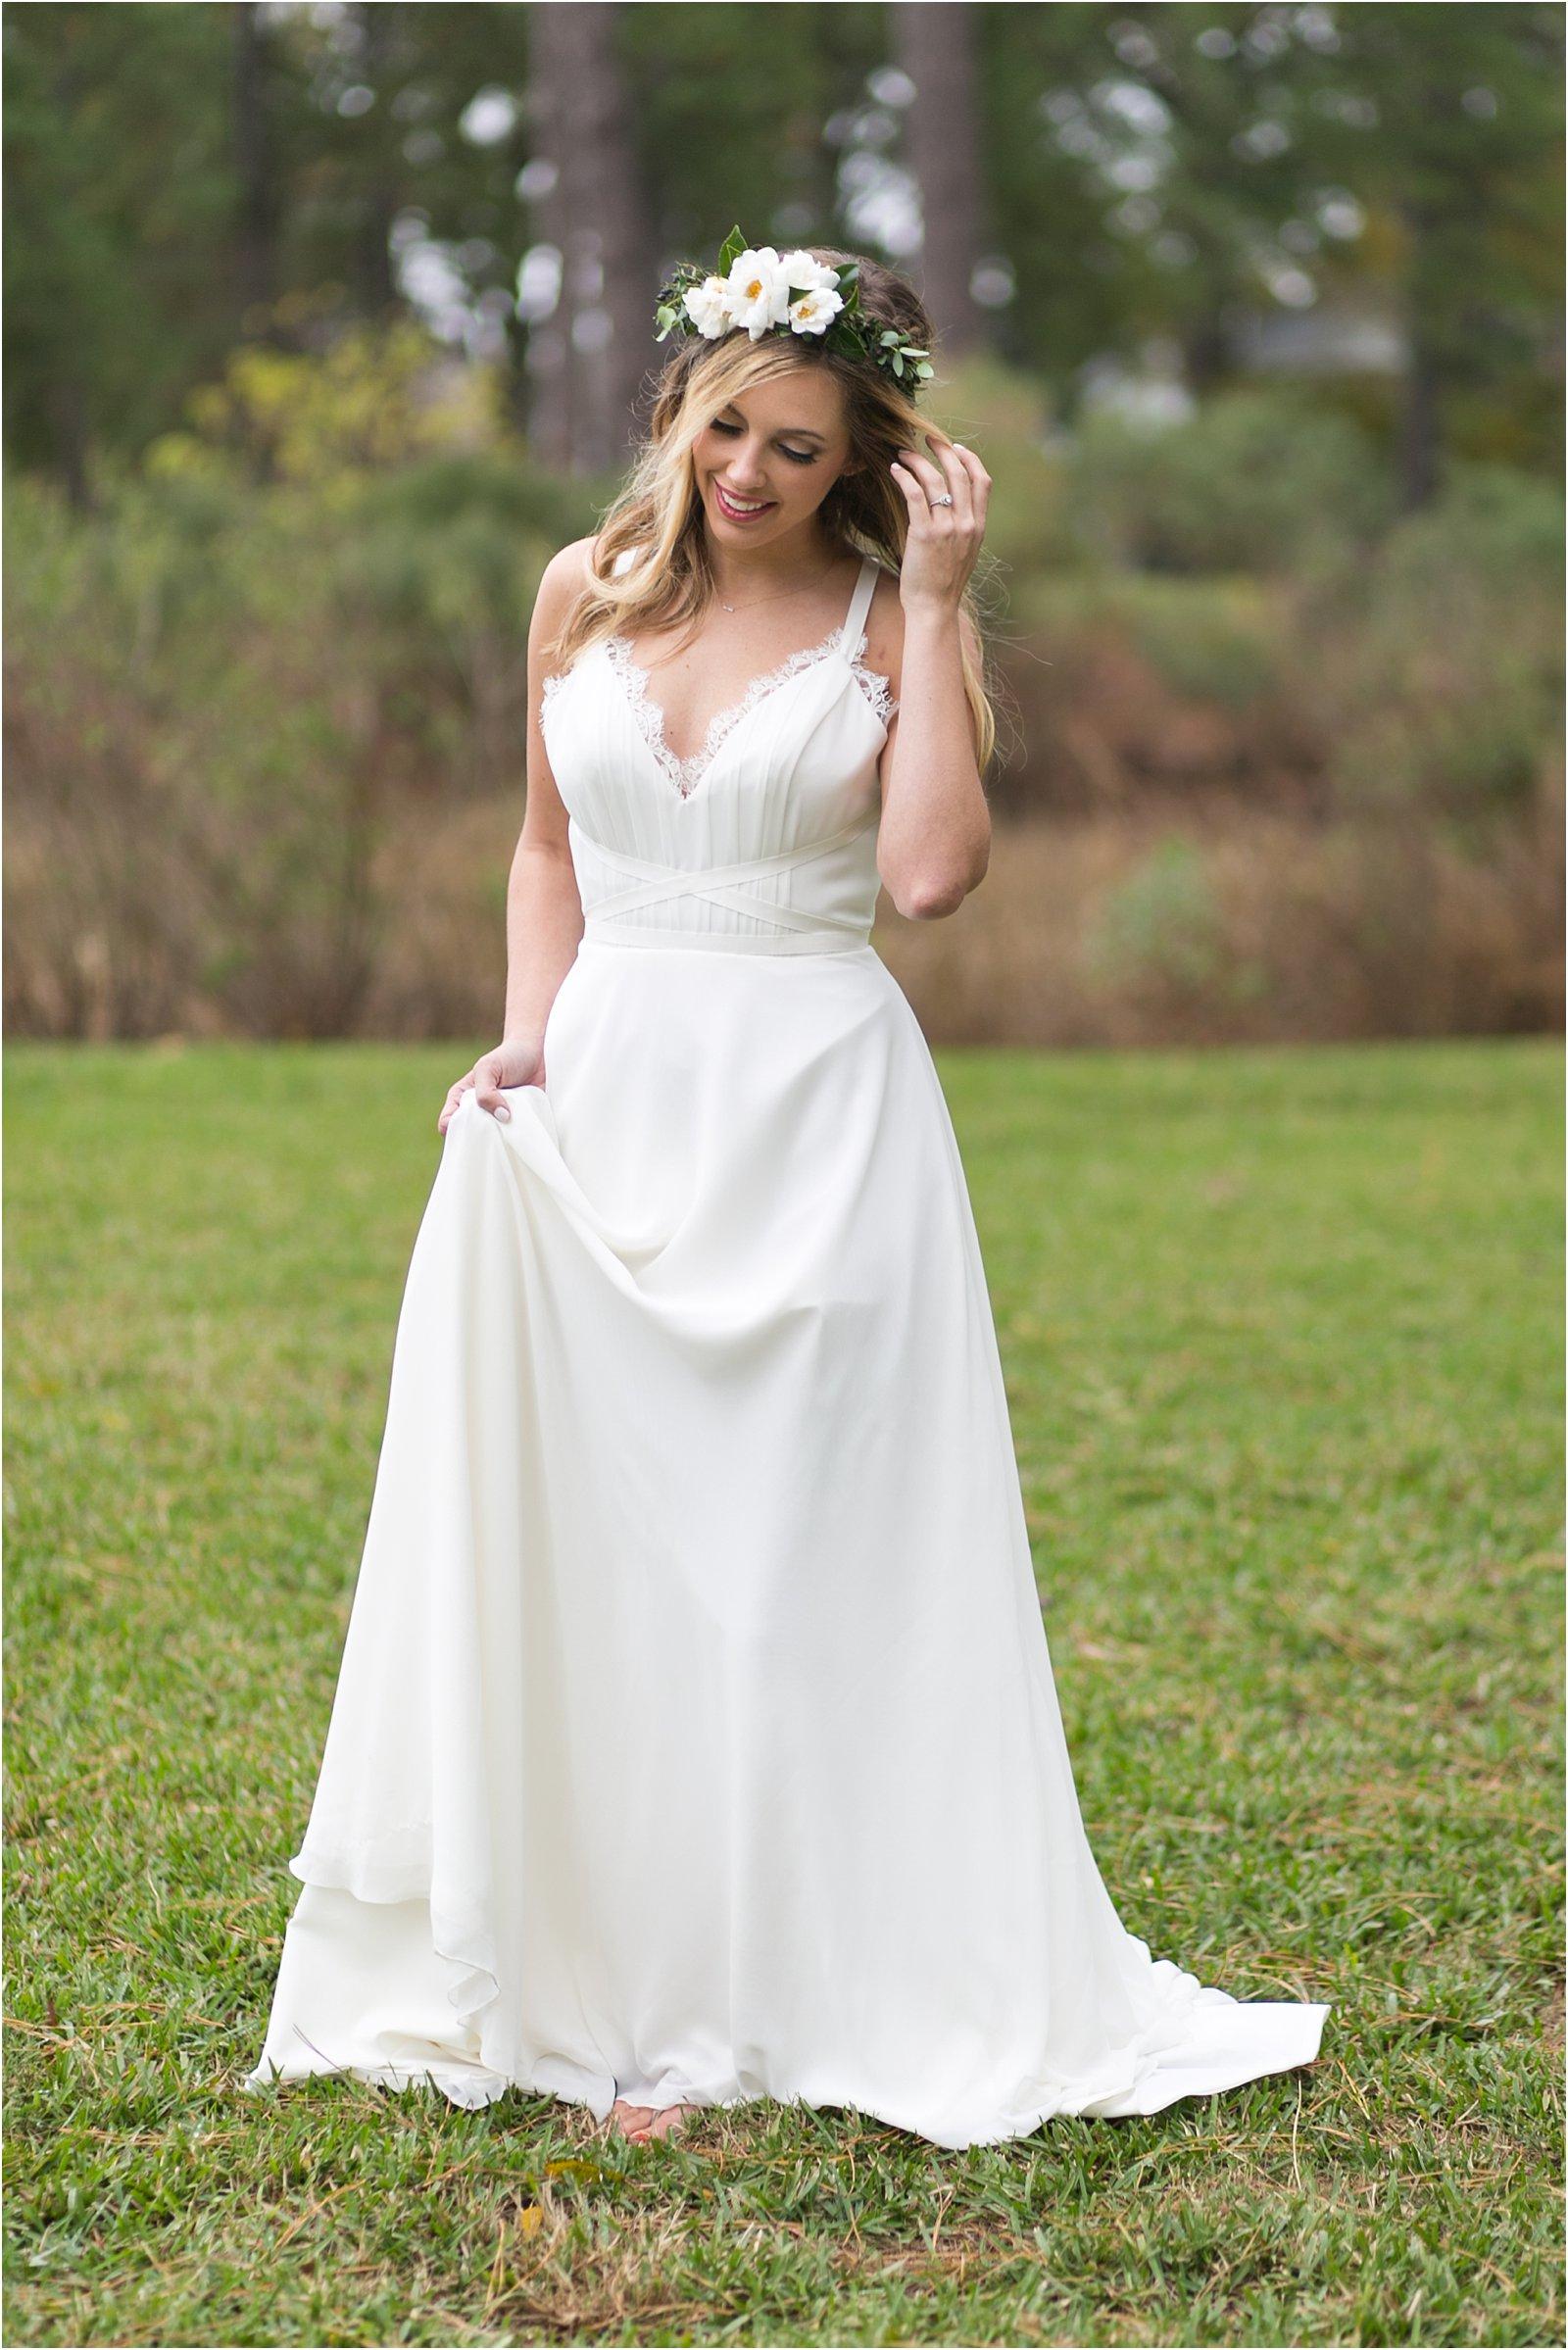 jessica_ryan_photography_womans_club_of_portsmouth_wedding_walk_through_a_wedding_bride_and_groom_0204